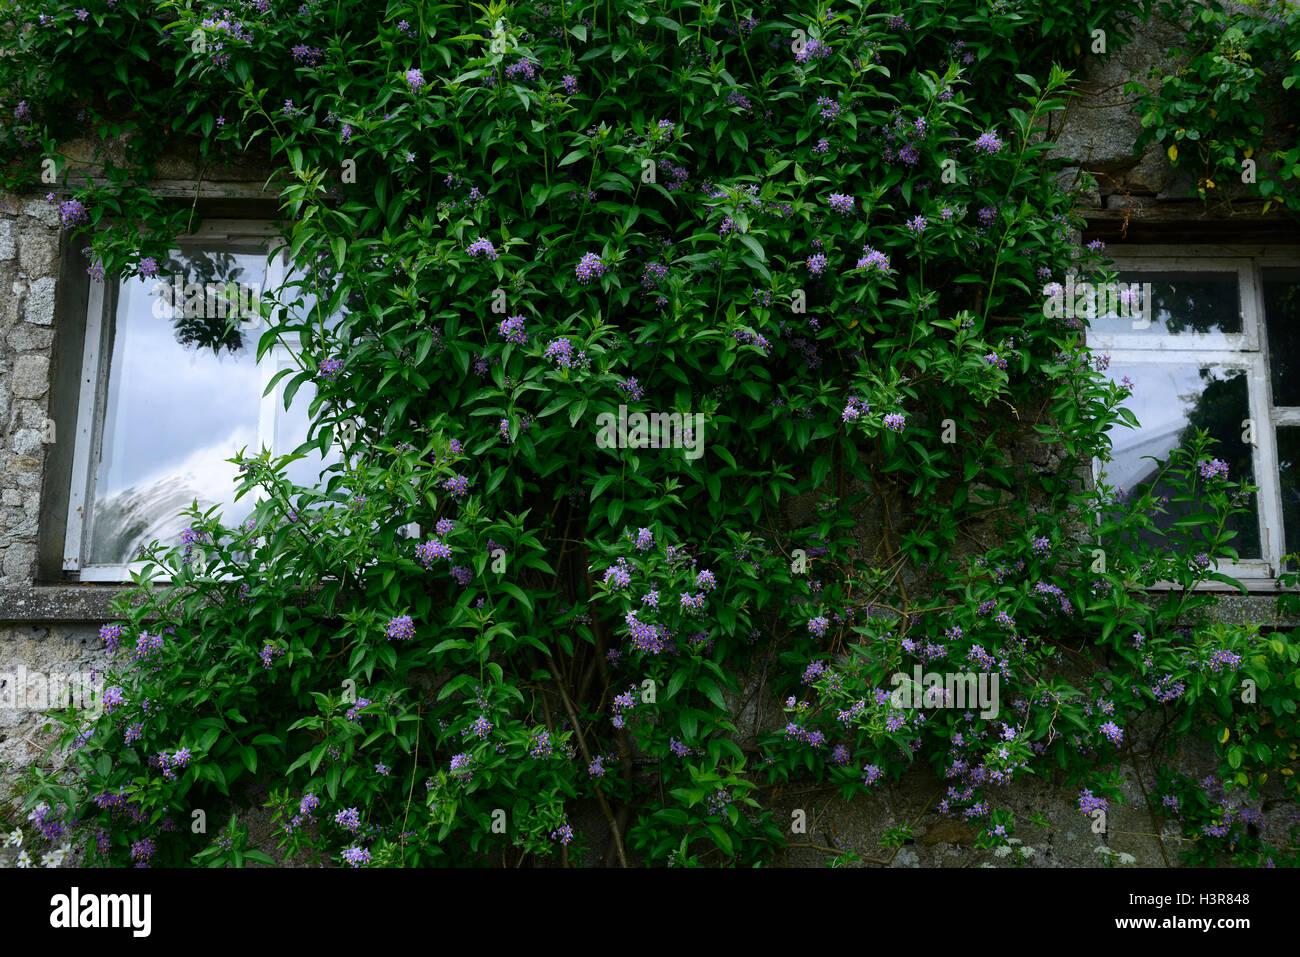 solanum crispum Glasnevin large scrambling semi-evergreen climbing shrub climber scrambler cover covering wall RM - Stock Image